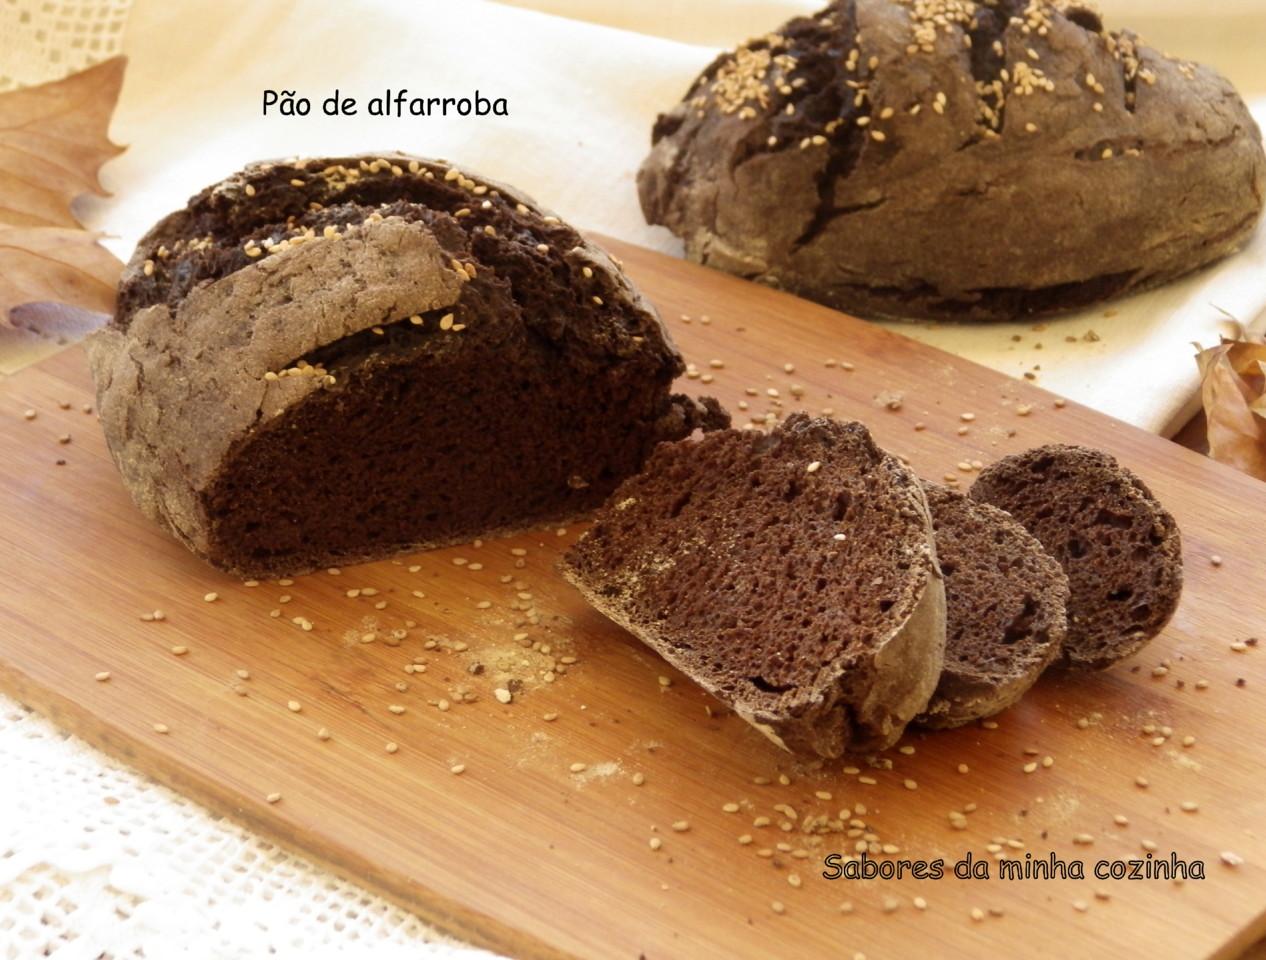 IMGP8729-Pão de alfarroba-Blog.JPG